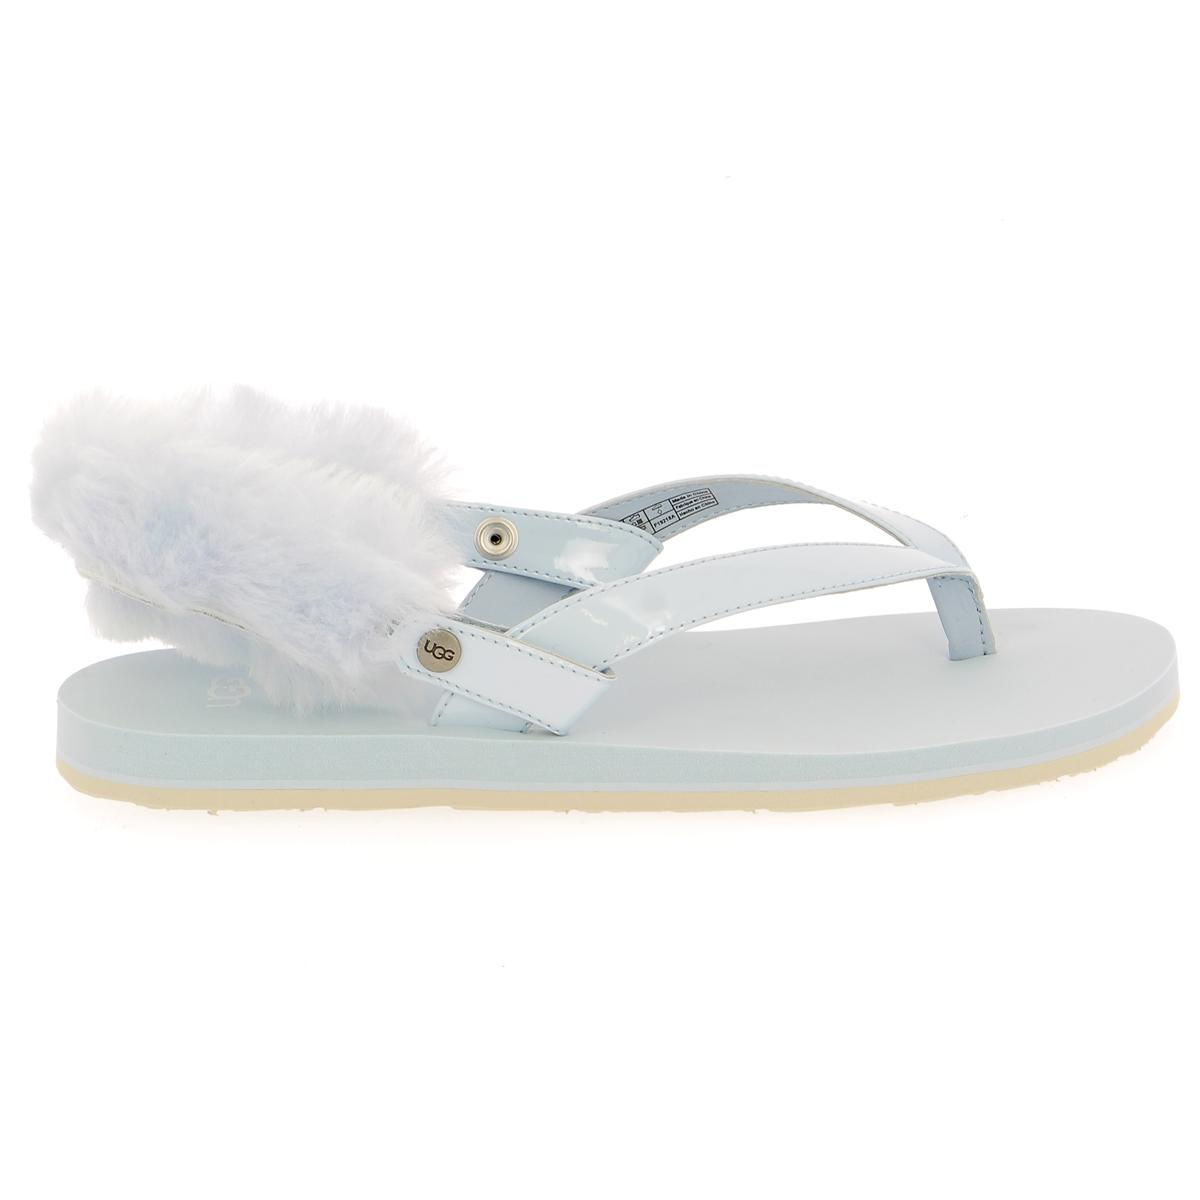 Ugg Muiltjes - slippers hemelsblauw